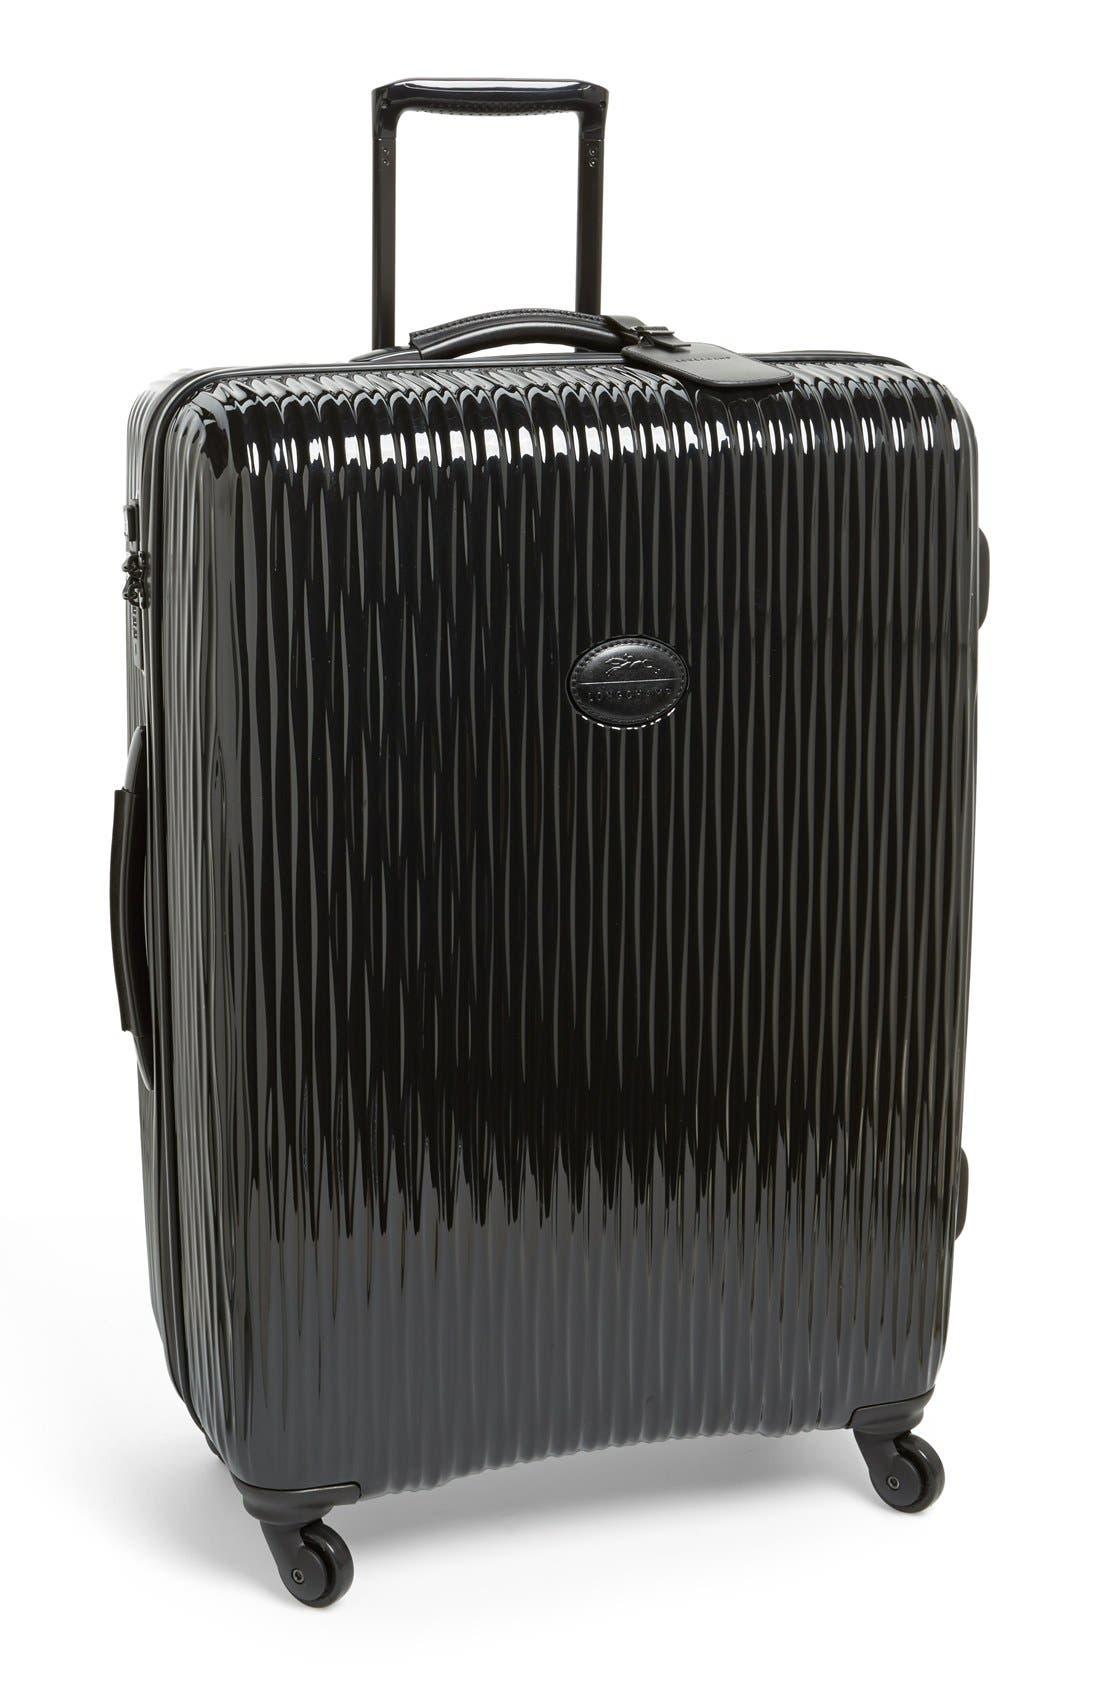 LONGCHAMP Large Fairval Four-Wheel Hard Shell Suitcase